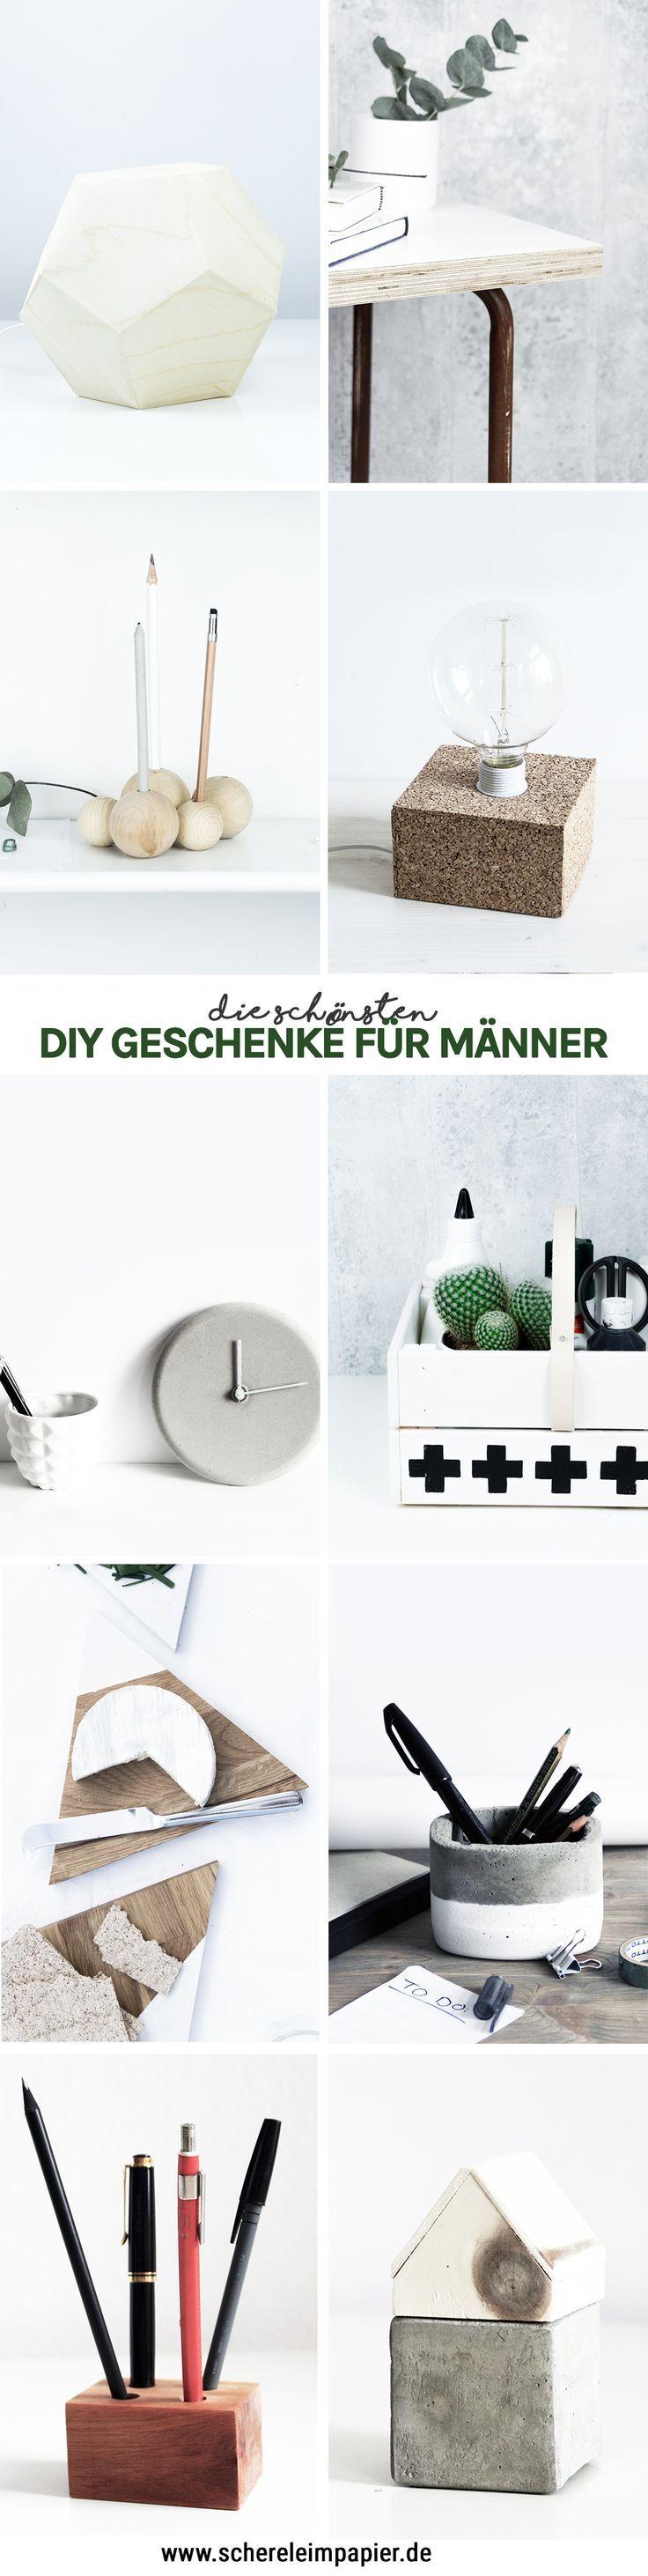 diy geschenke für männer selber machen - 10 kreative ideen | diy